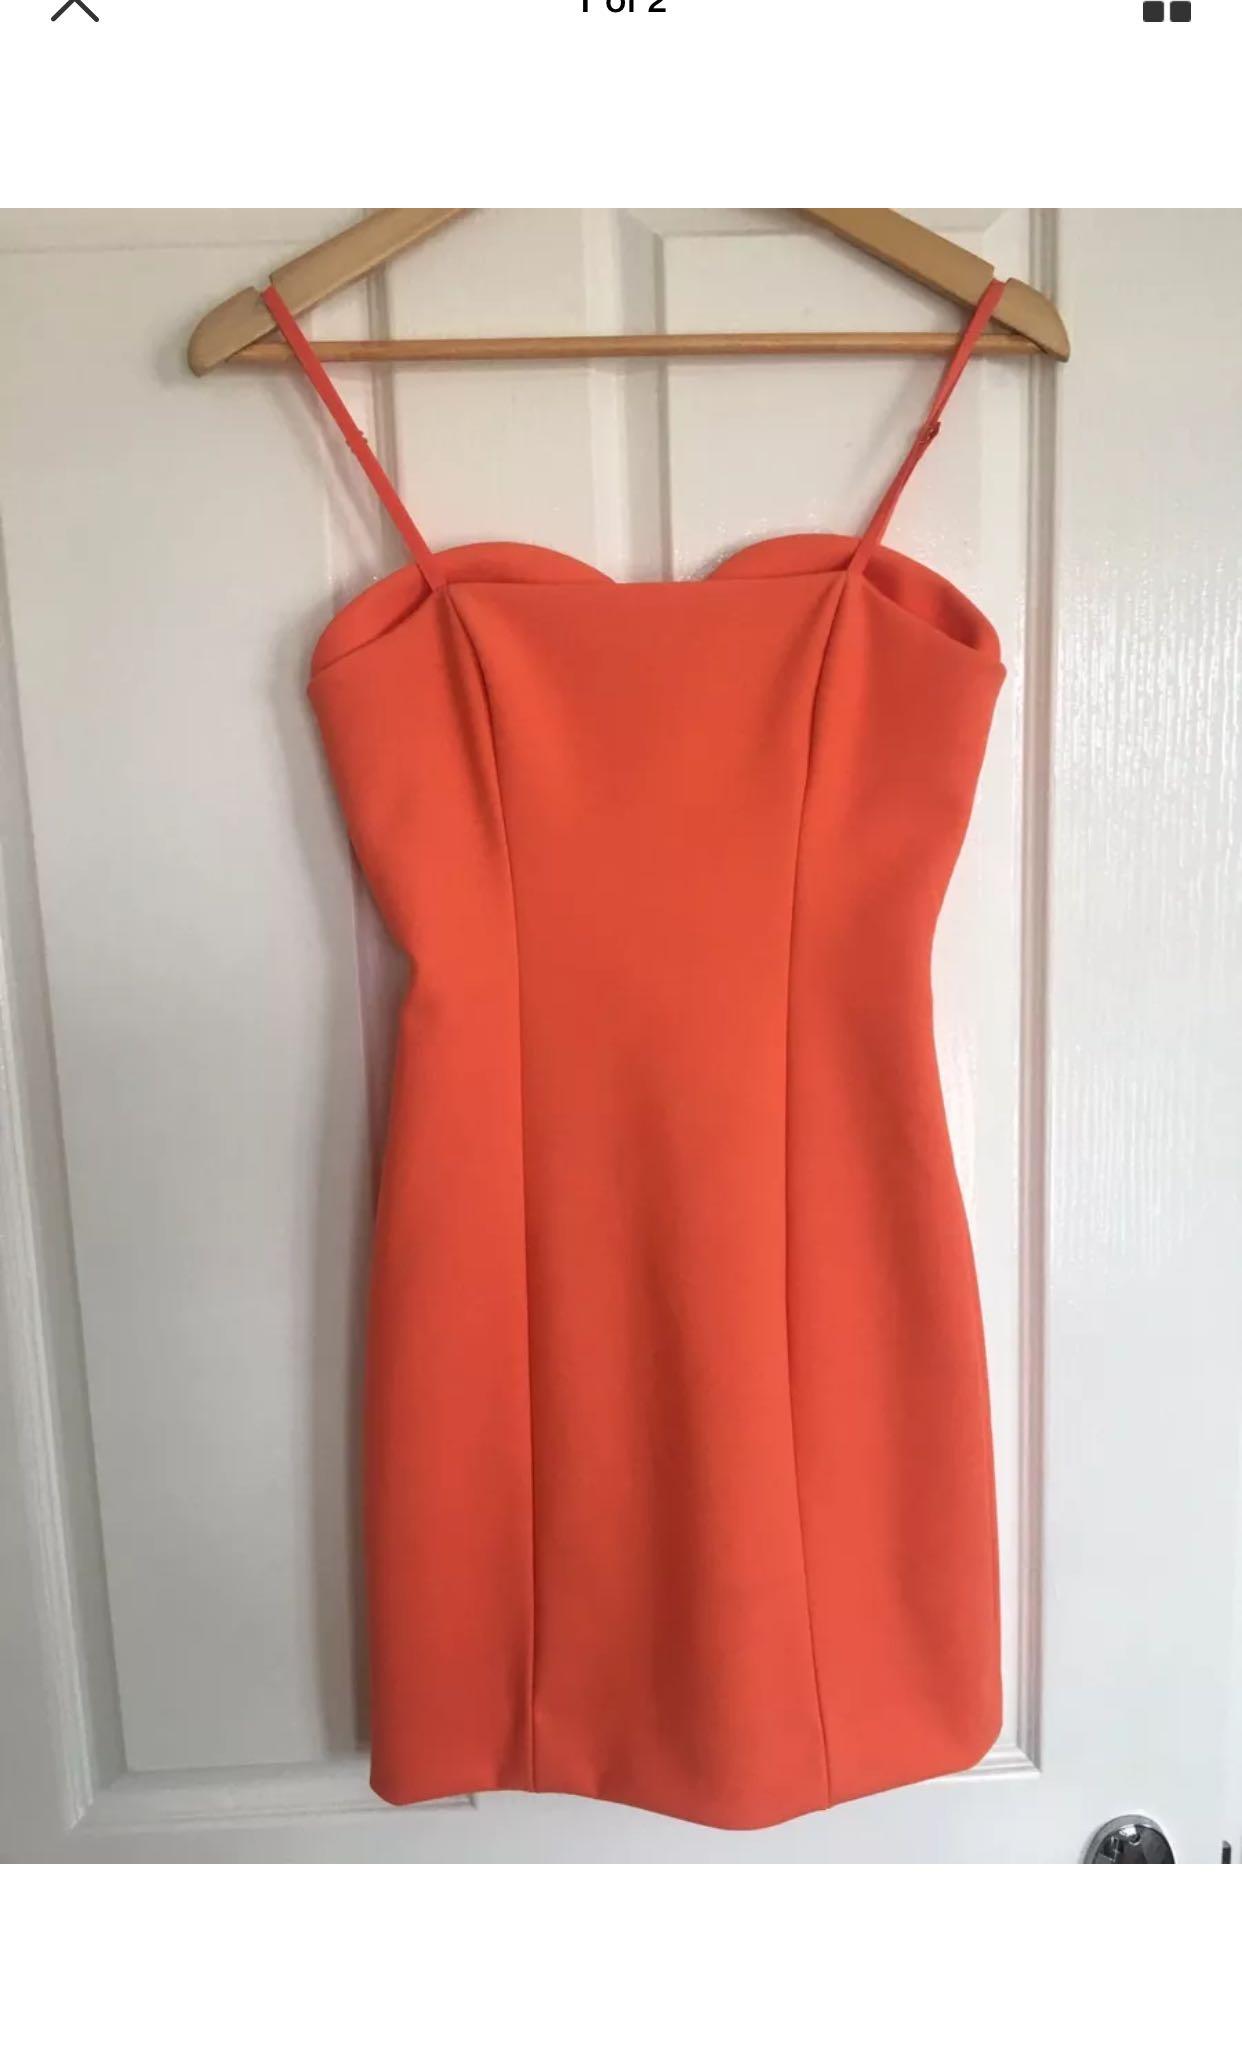 Kookai Tangerine Dress Size 36 6 Worn Once Only